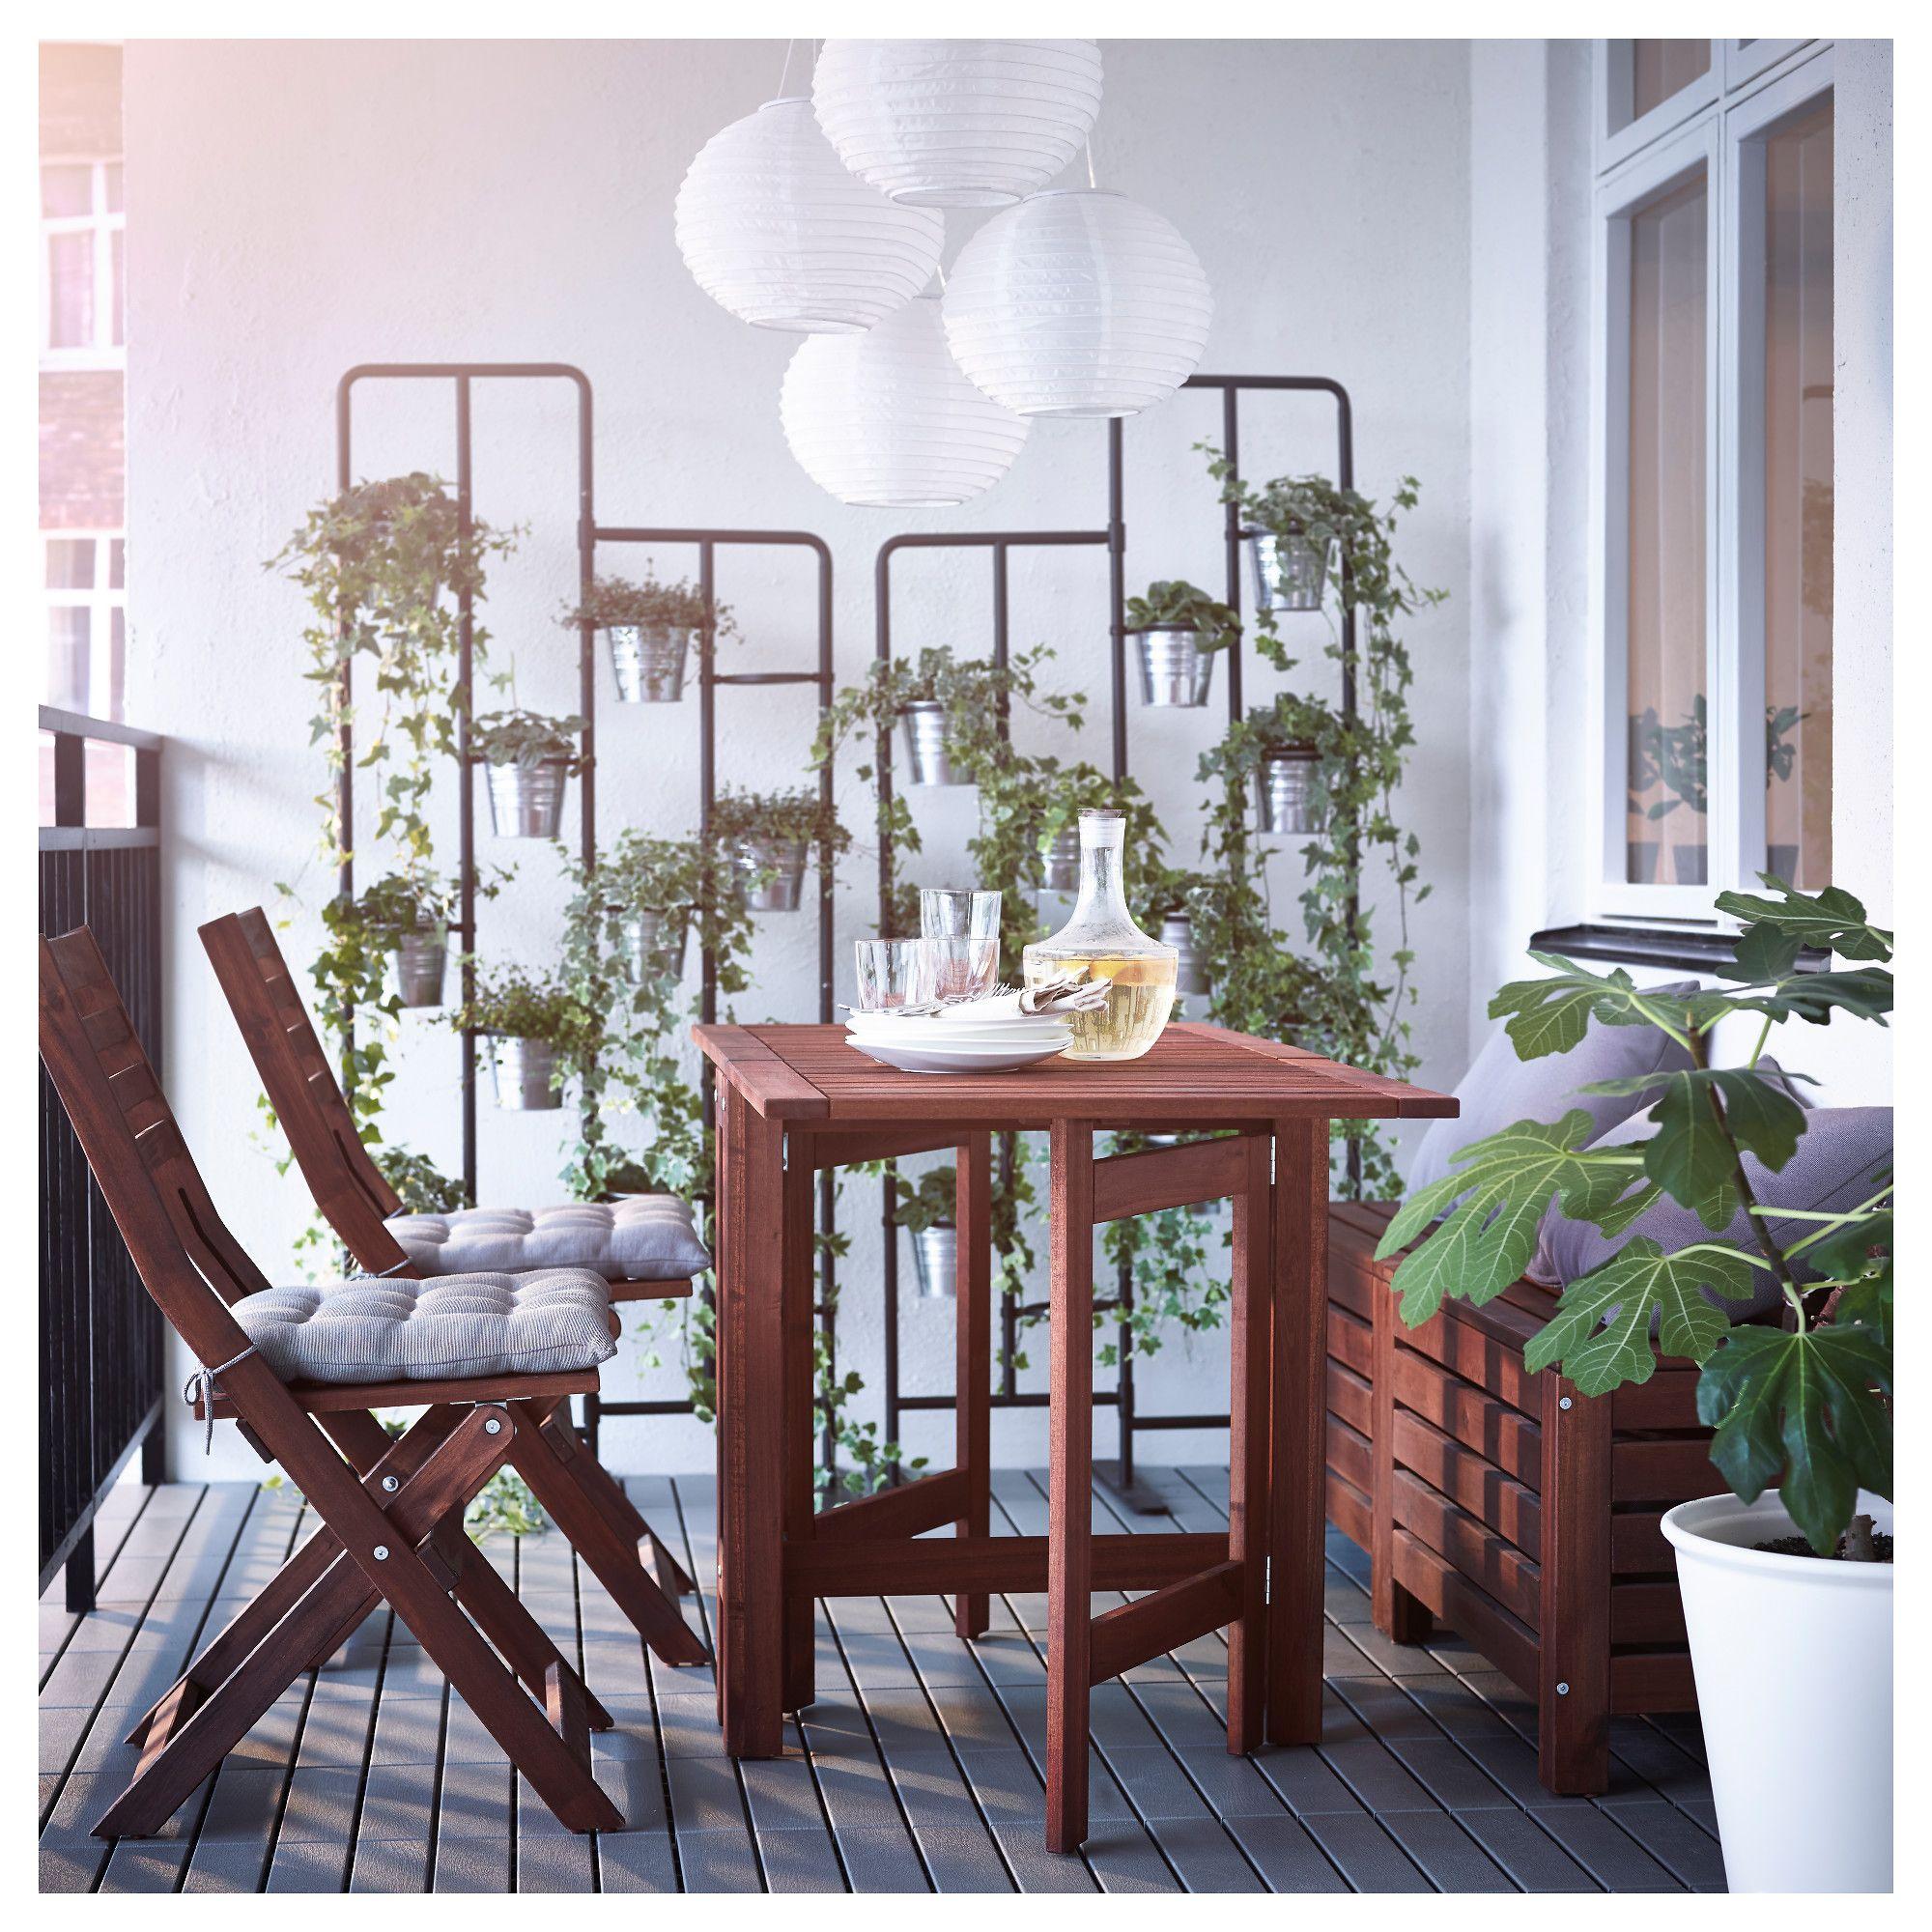 Furniture And Home Furnishings Casa Unifamiliar